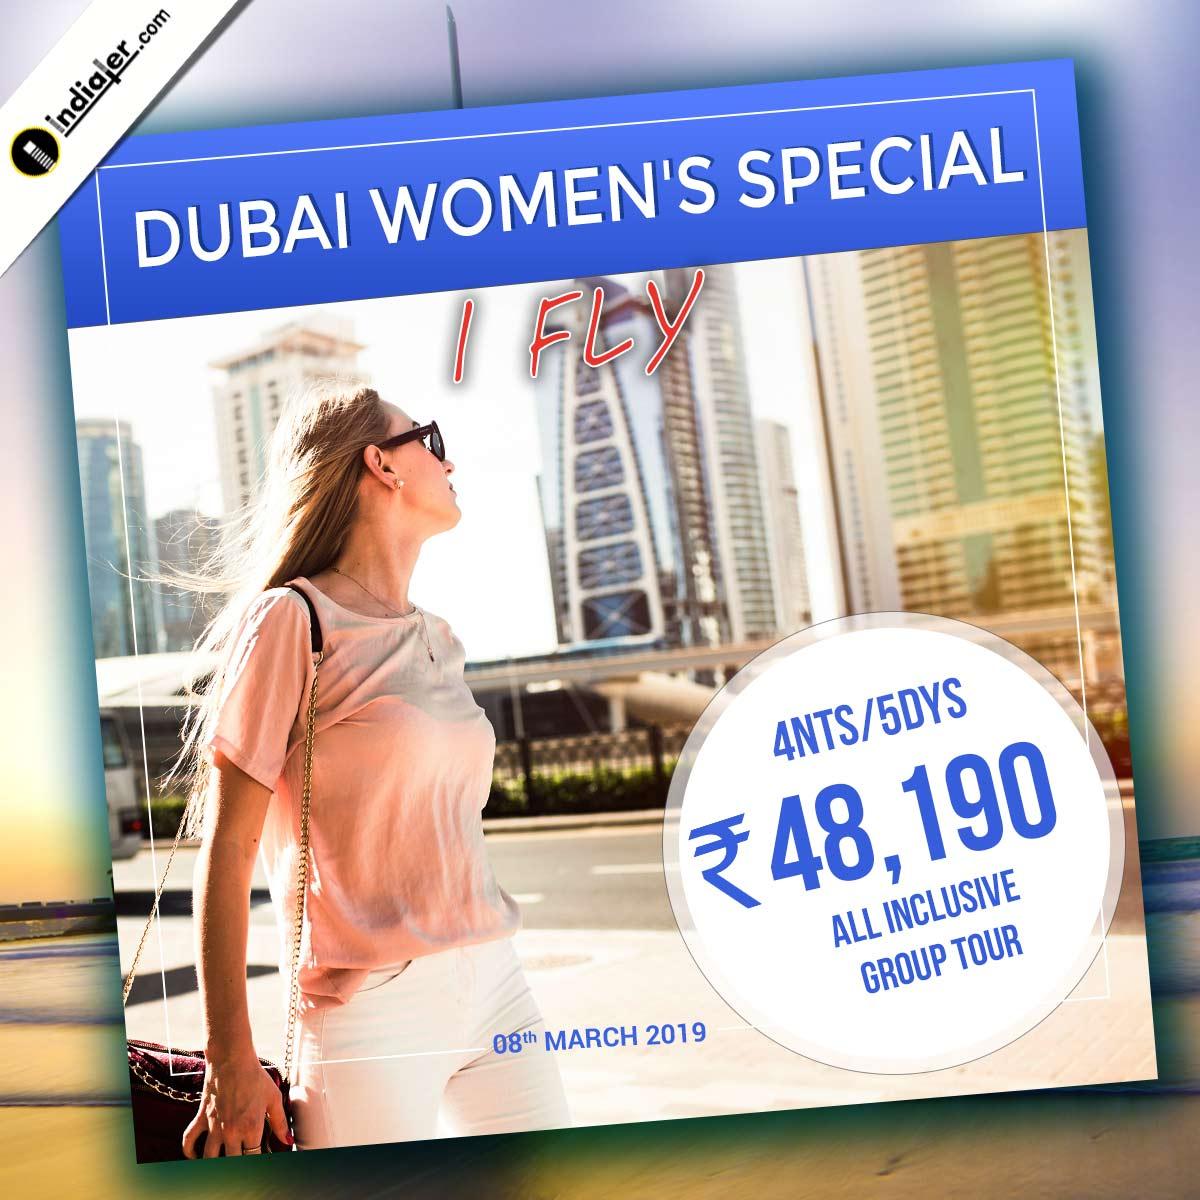 dubai-womens-special-travel-banner